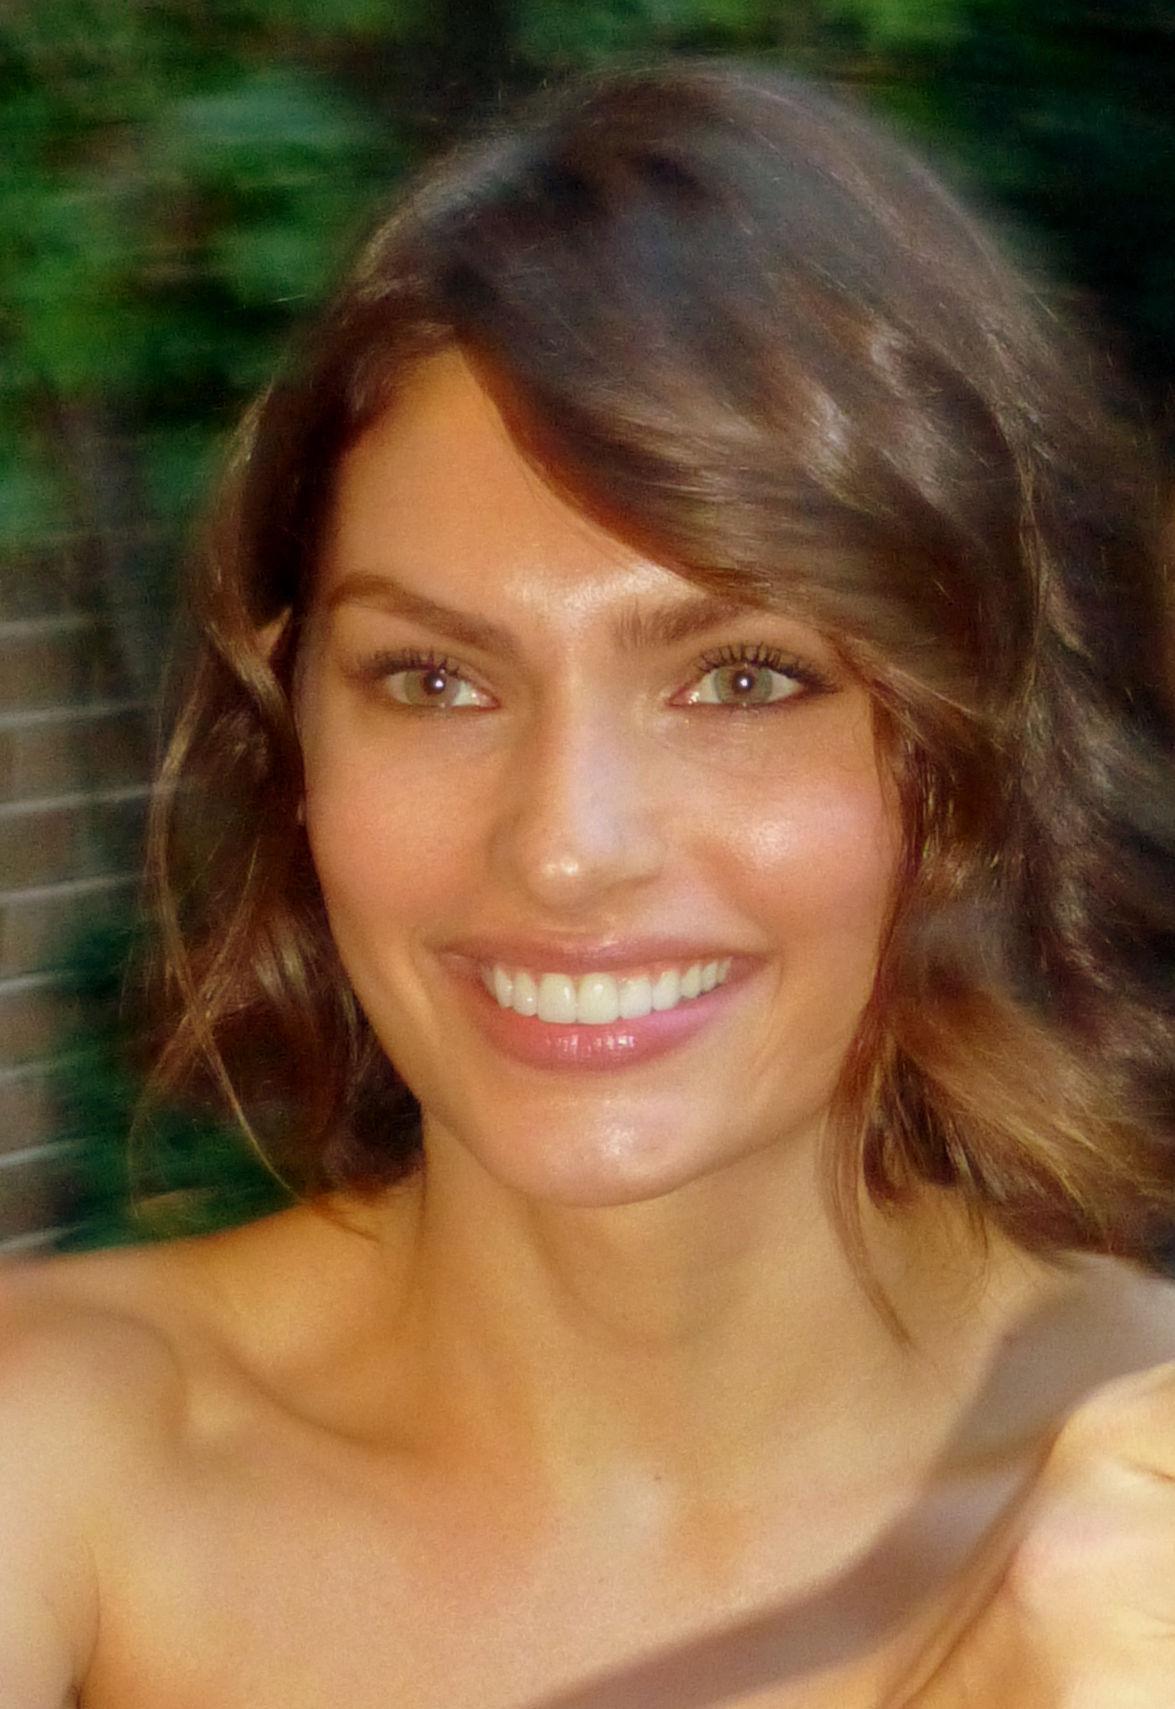 Photo of Alyssa Miller: American model